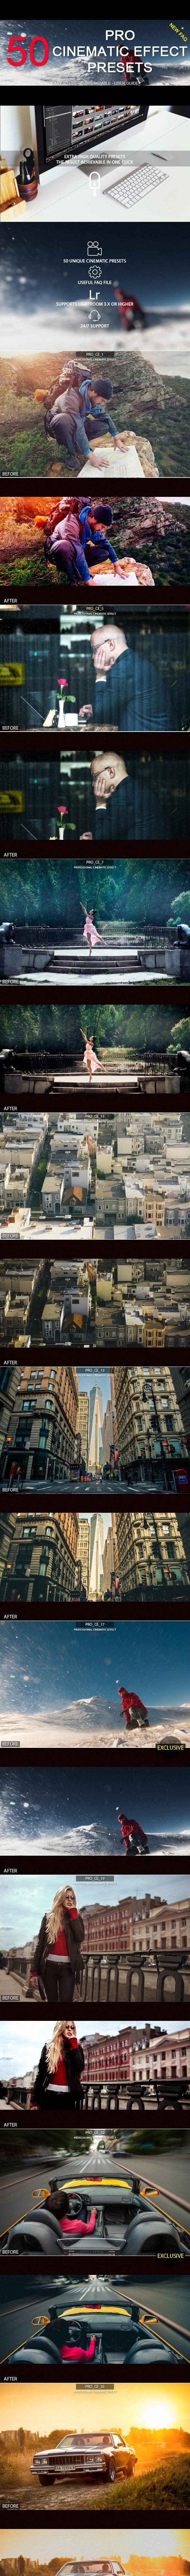 50 Pro Cinematic Effect Presets - Cinematic Lightroom Presets